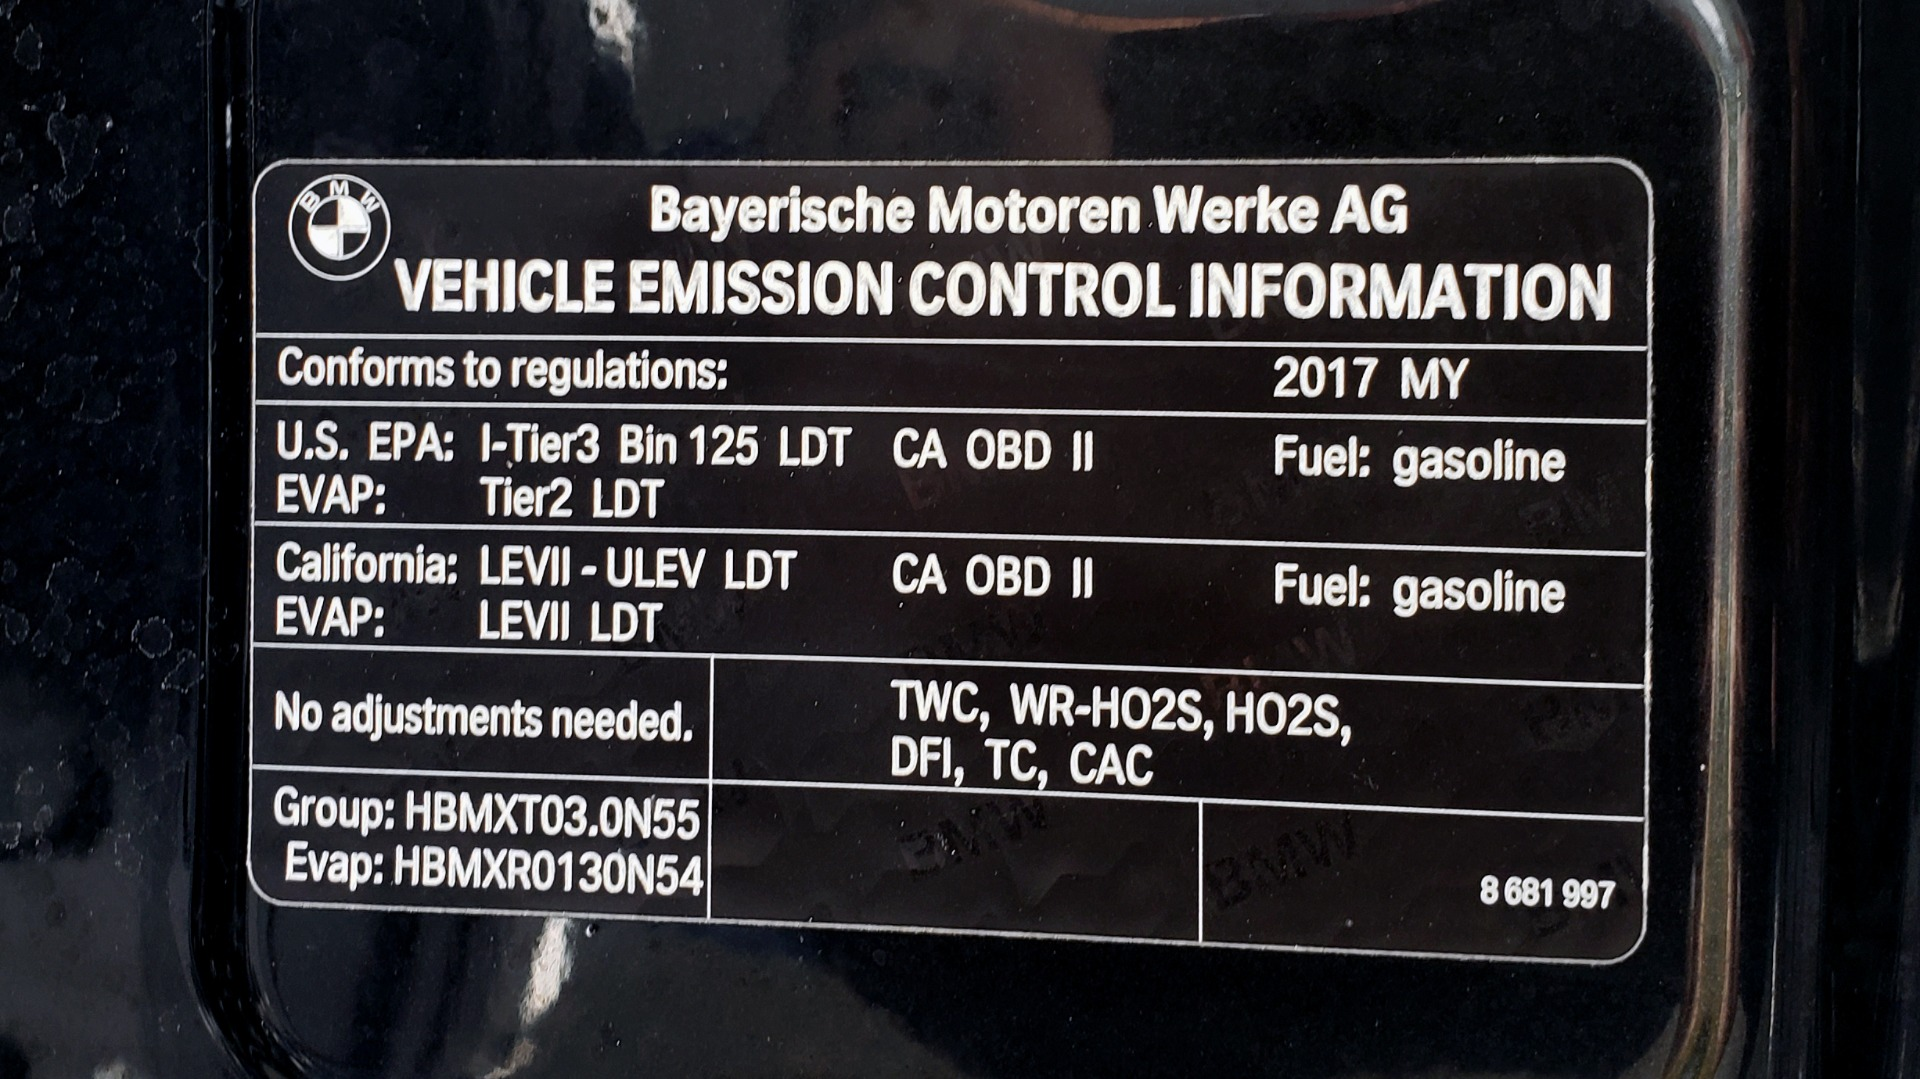 Used 2017 BMW X3 XDRIVE35I M-SPORT / DRVR ASST PLUS / TECHNOLOGY / HUD / BLIND SPOT for sale Sold at Formula Imports in Charlotte NC 28227 13